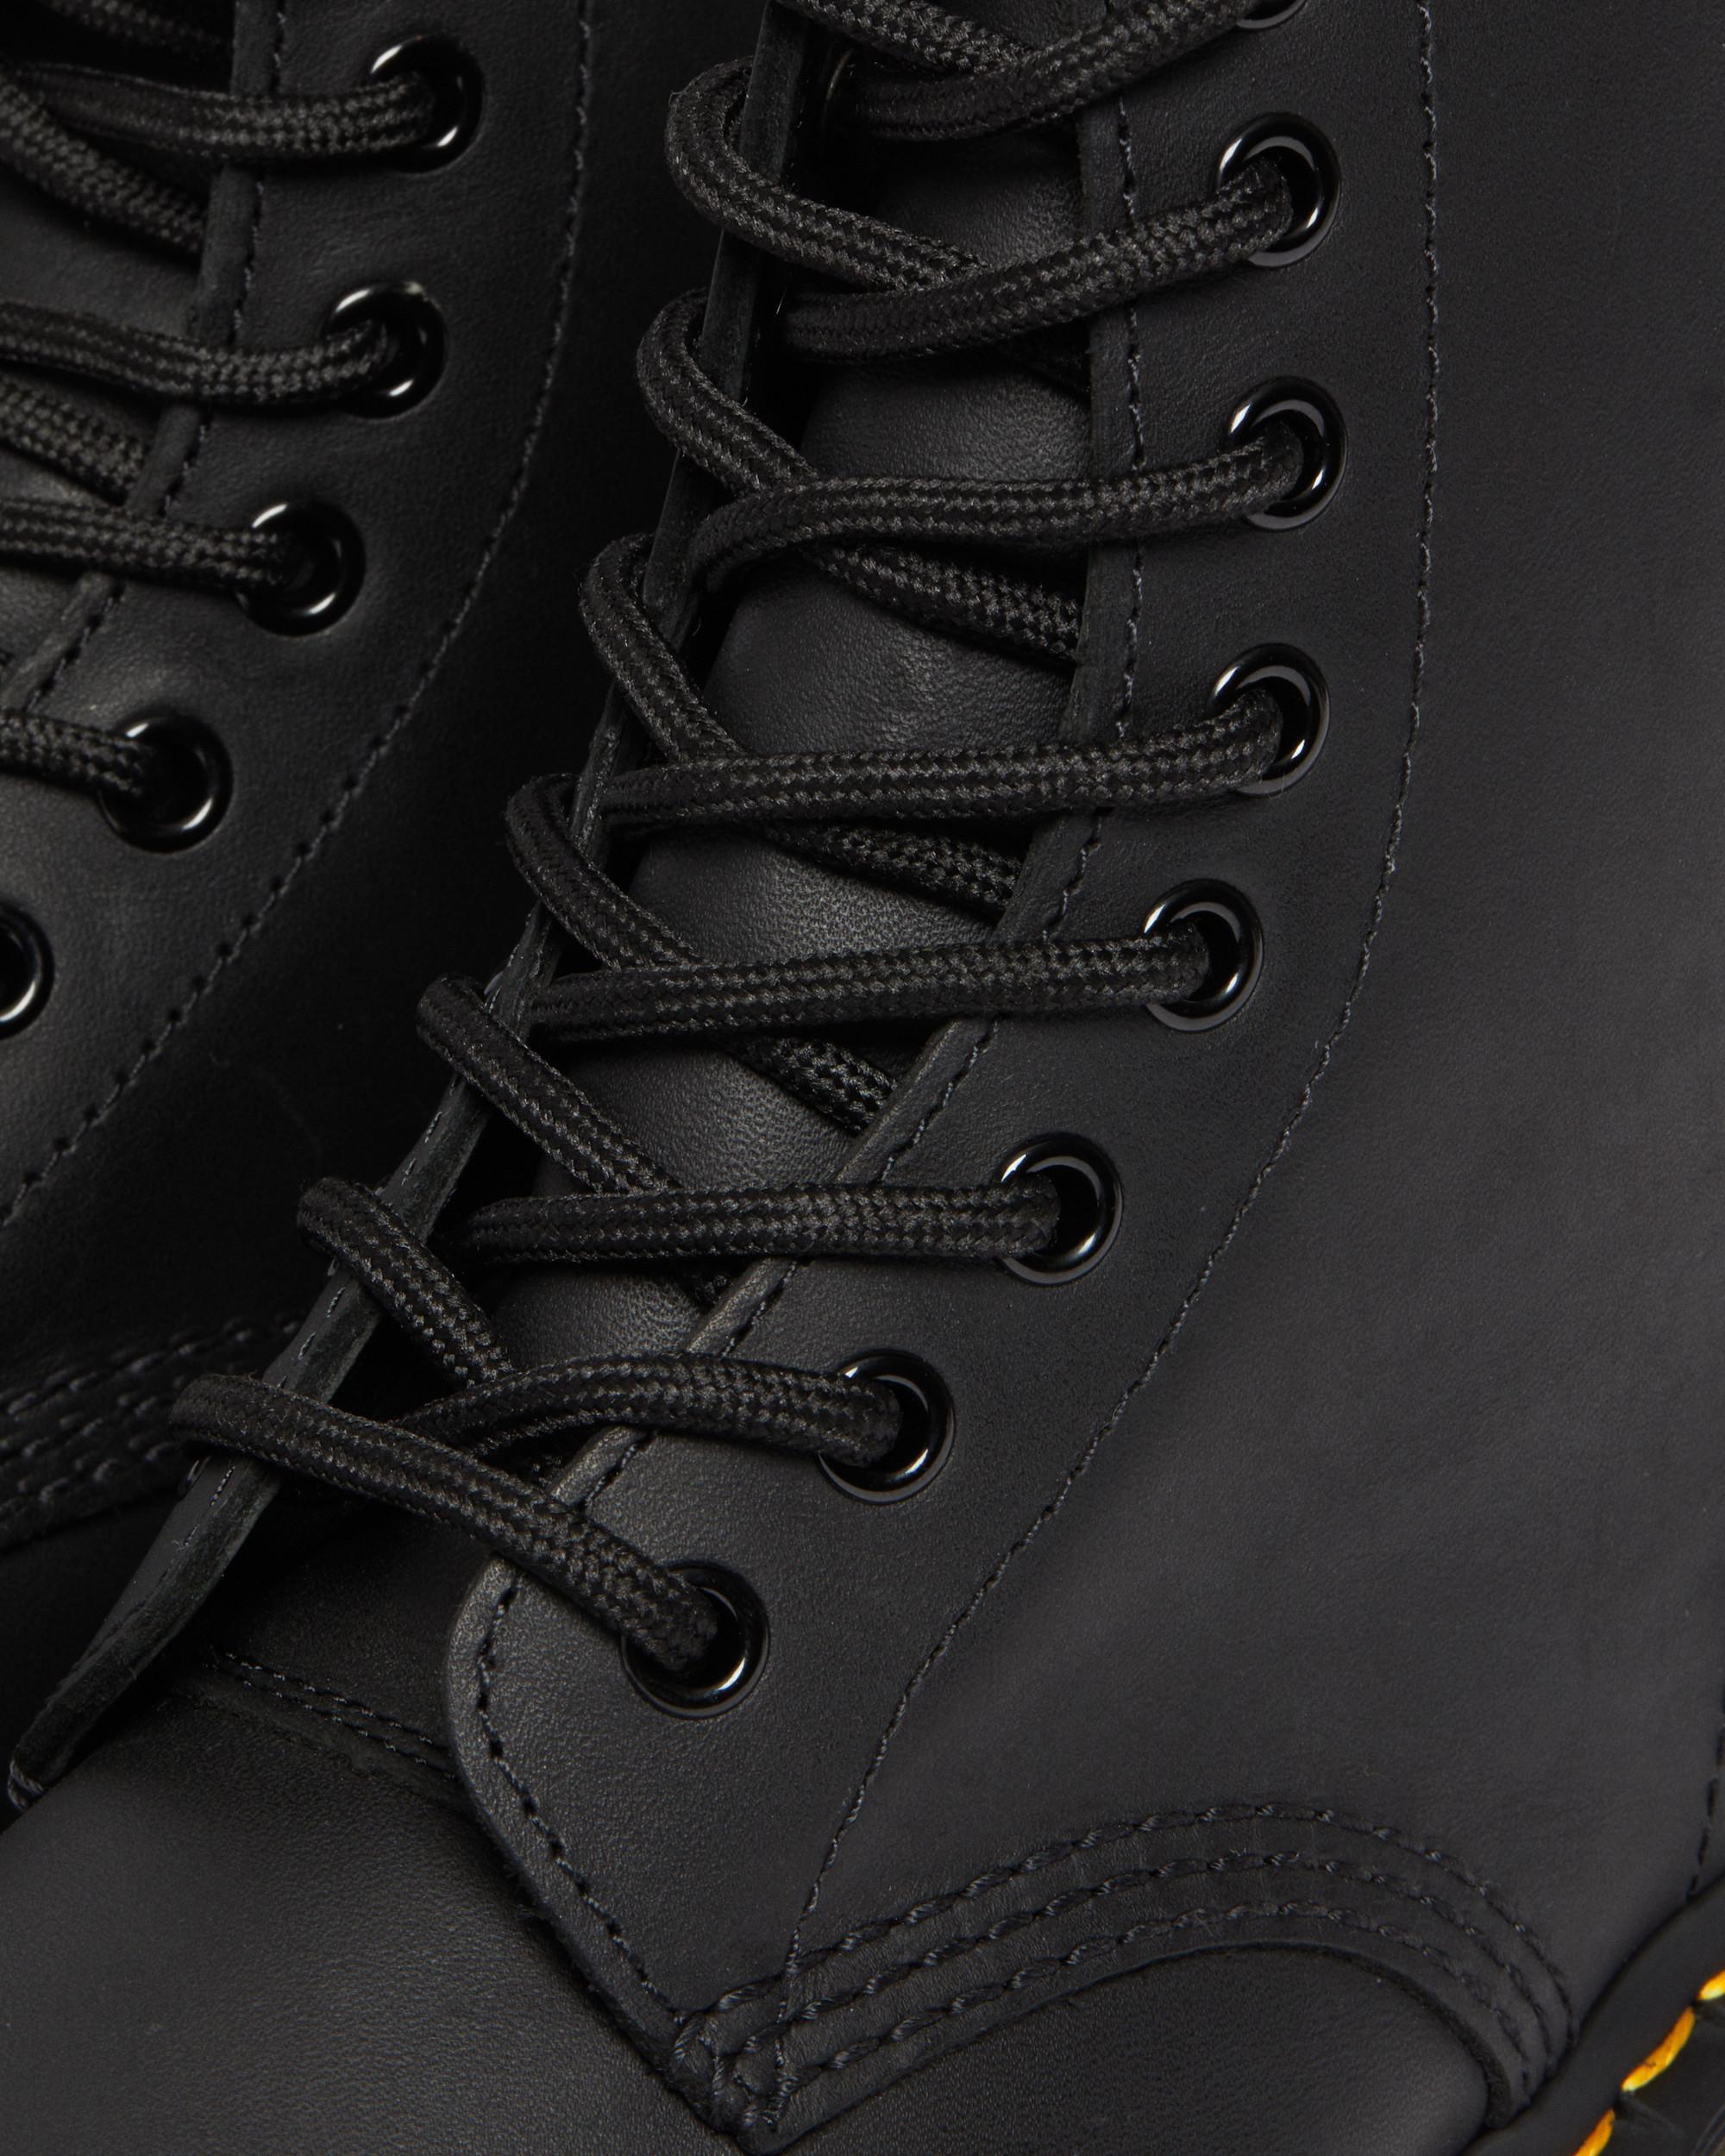 Dr. Martens 1460 8 eyes Greasy Black 11822003 Men's Boots | eBay